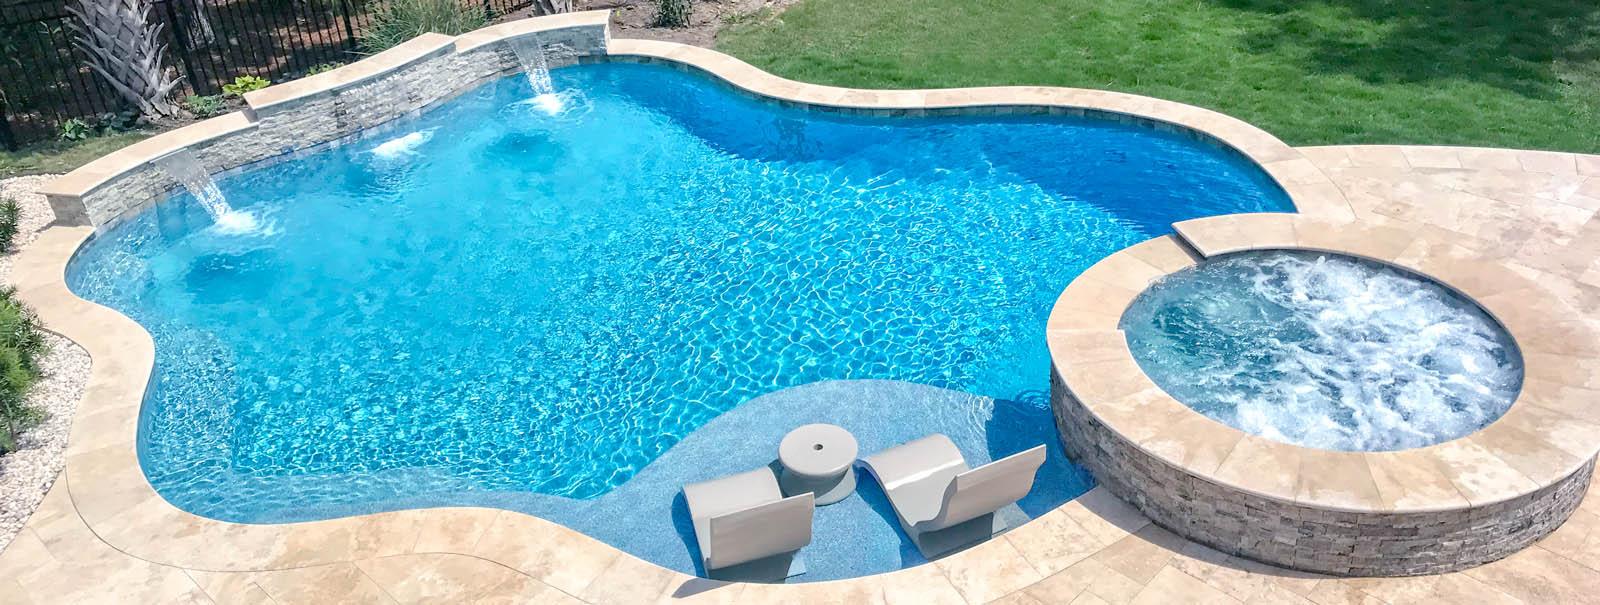 Custom Inground Pool Builder Beaumont Tx